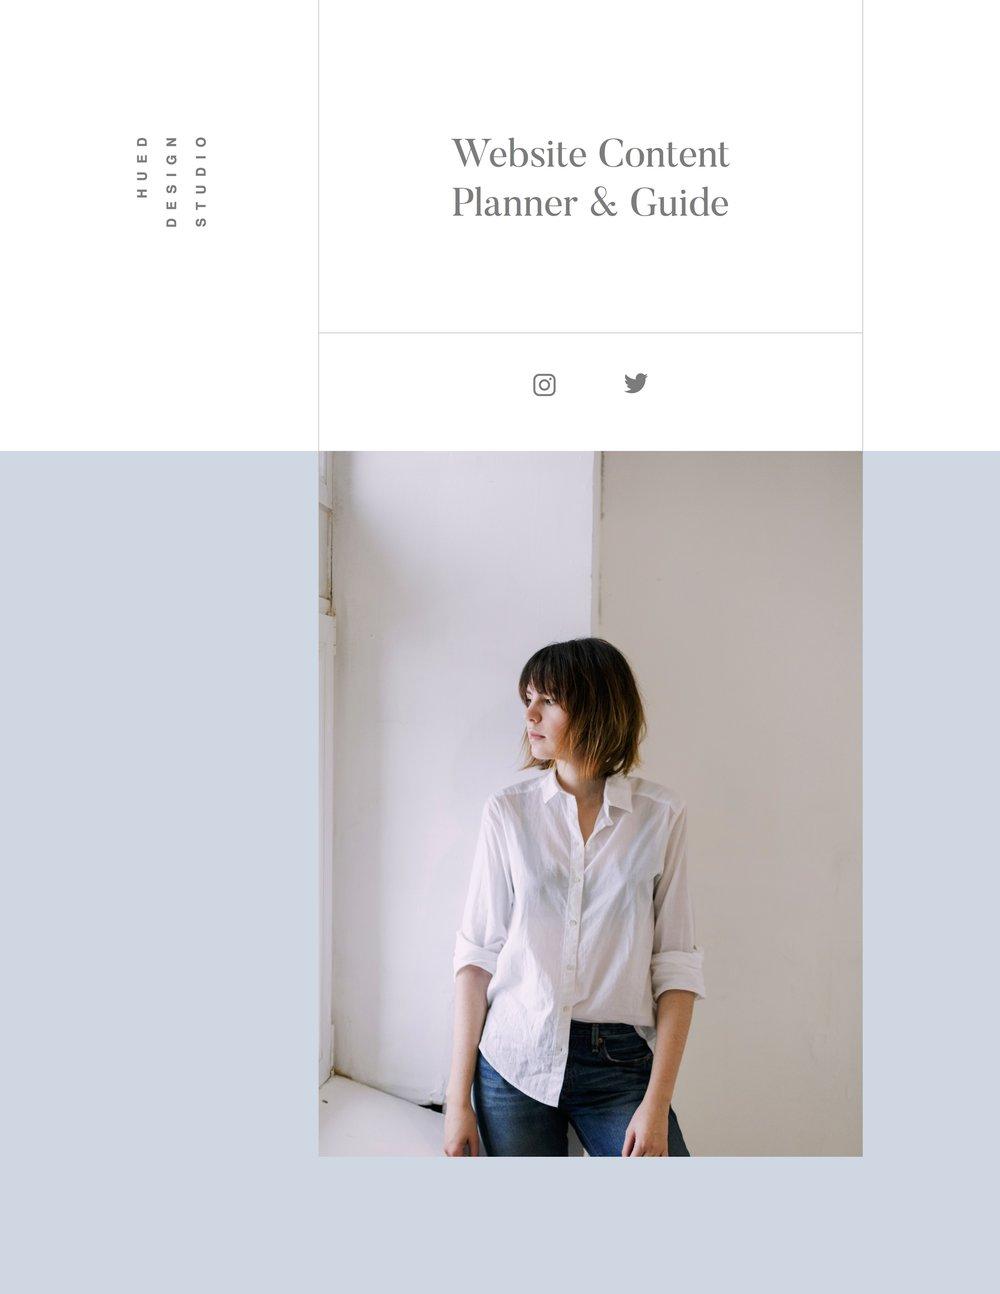 HDS - Website Content Planner-main.jpg